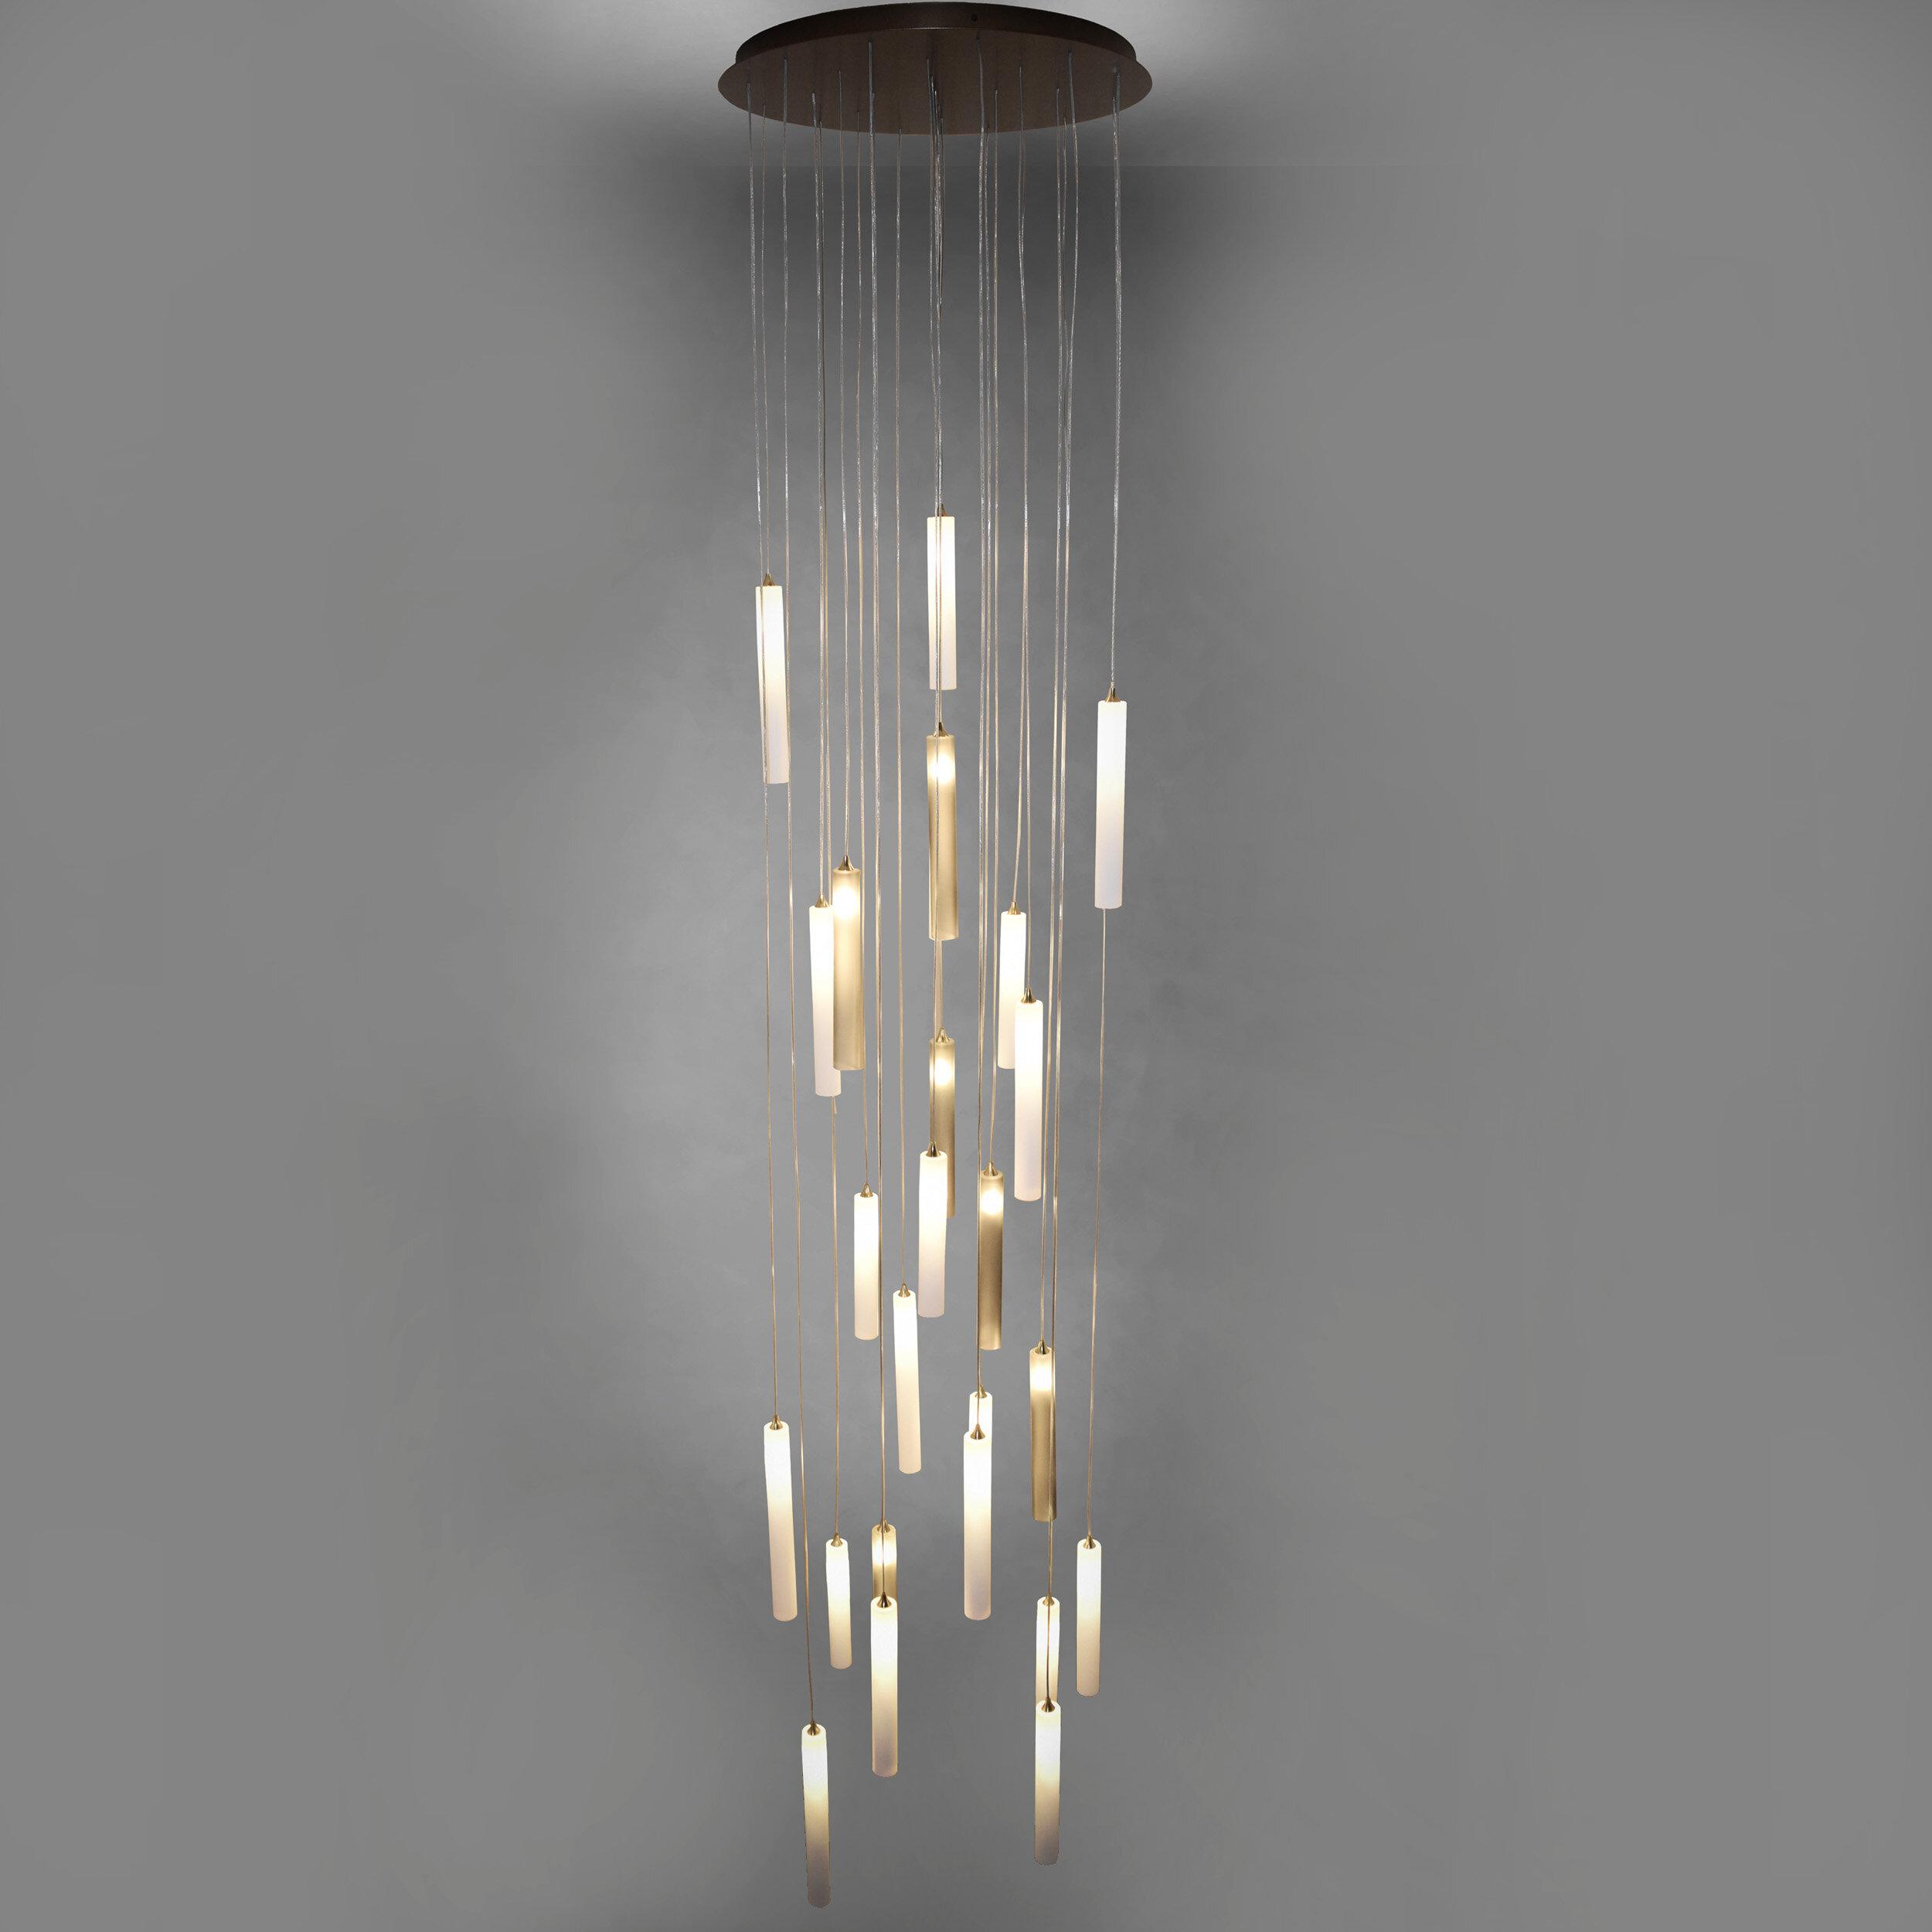 Galilee Lighting Rainfall 25 Light Cluster Cylinder Pendant Perigold